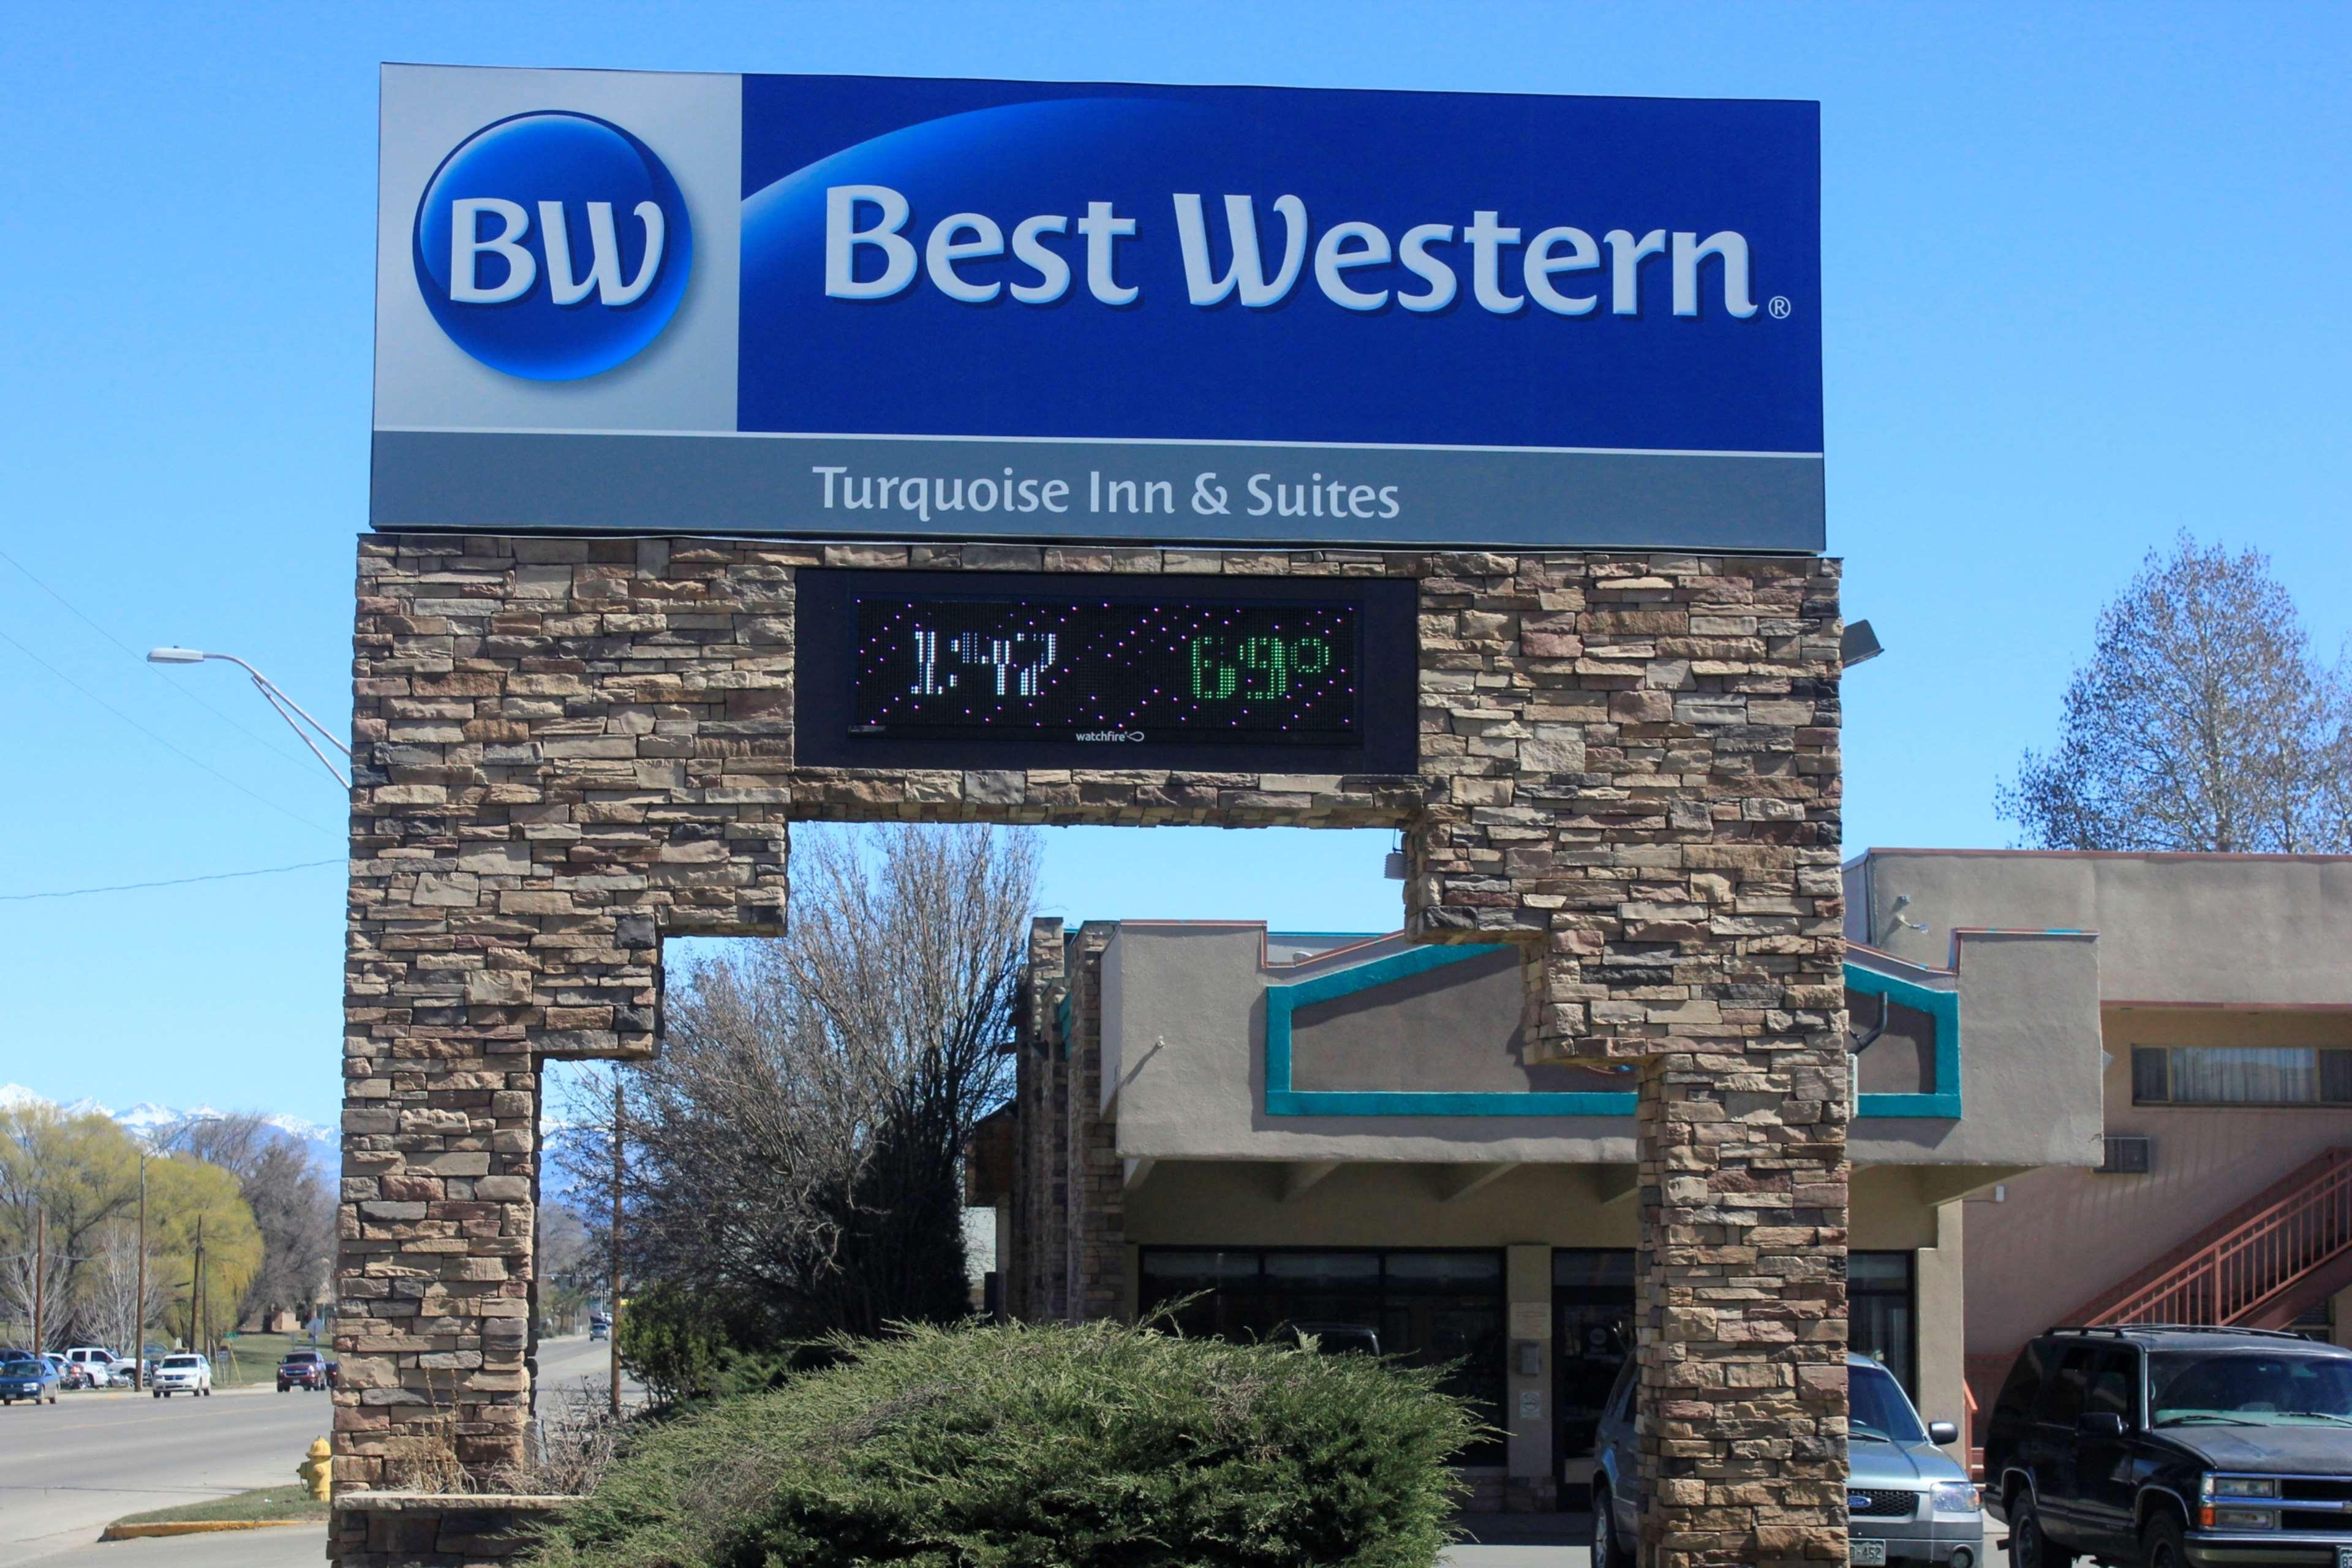 Best Western Turquoise Inn & Suites image 0